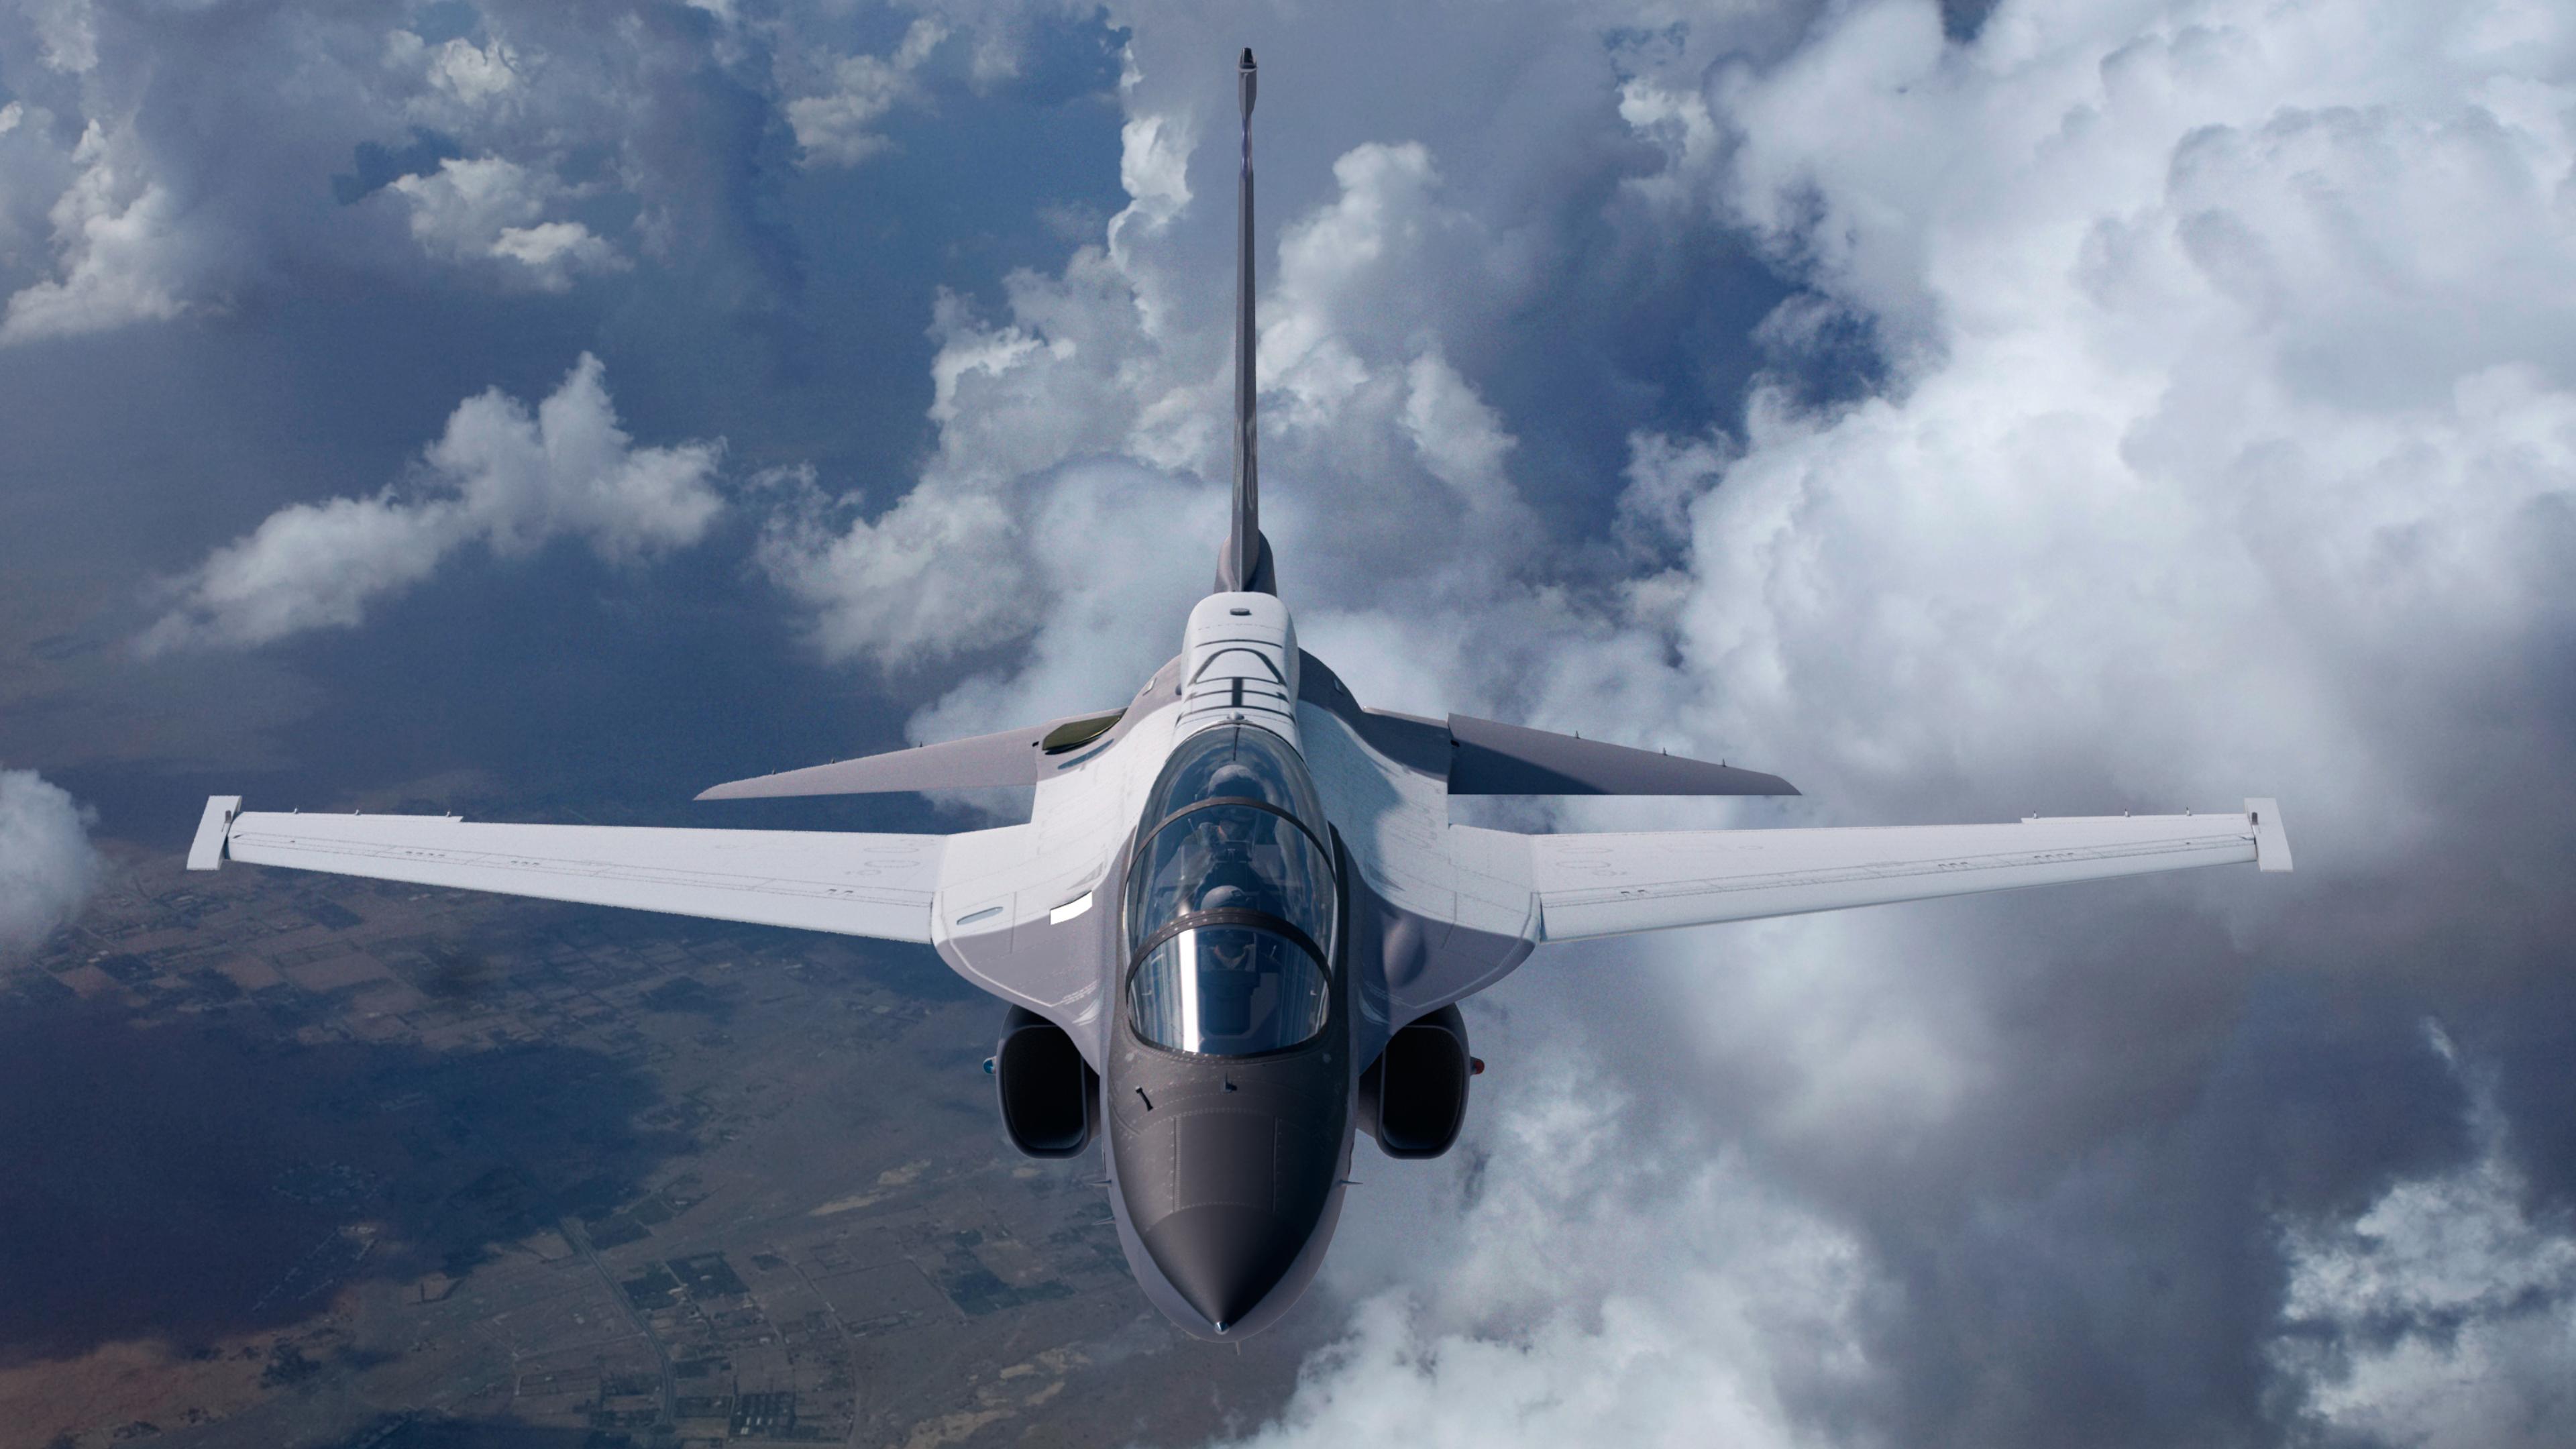 635907945332468962-T-50A-Head-on-Lockheed-Martin-photo-1-.jpg